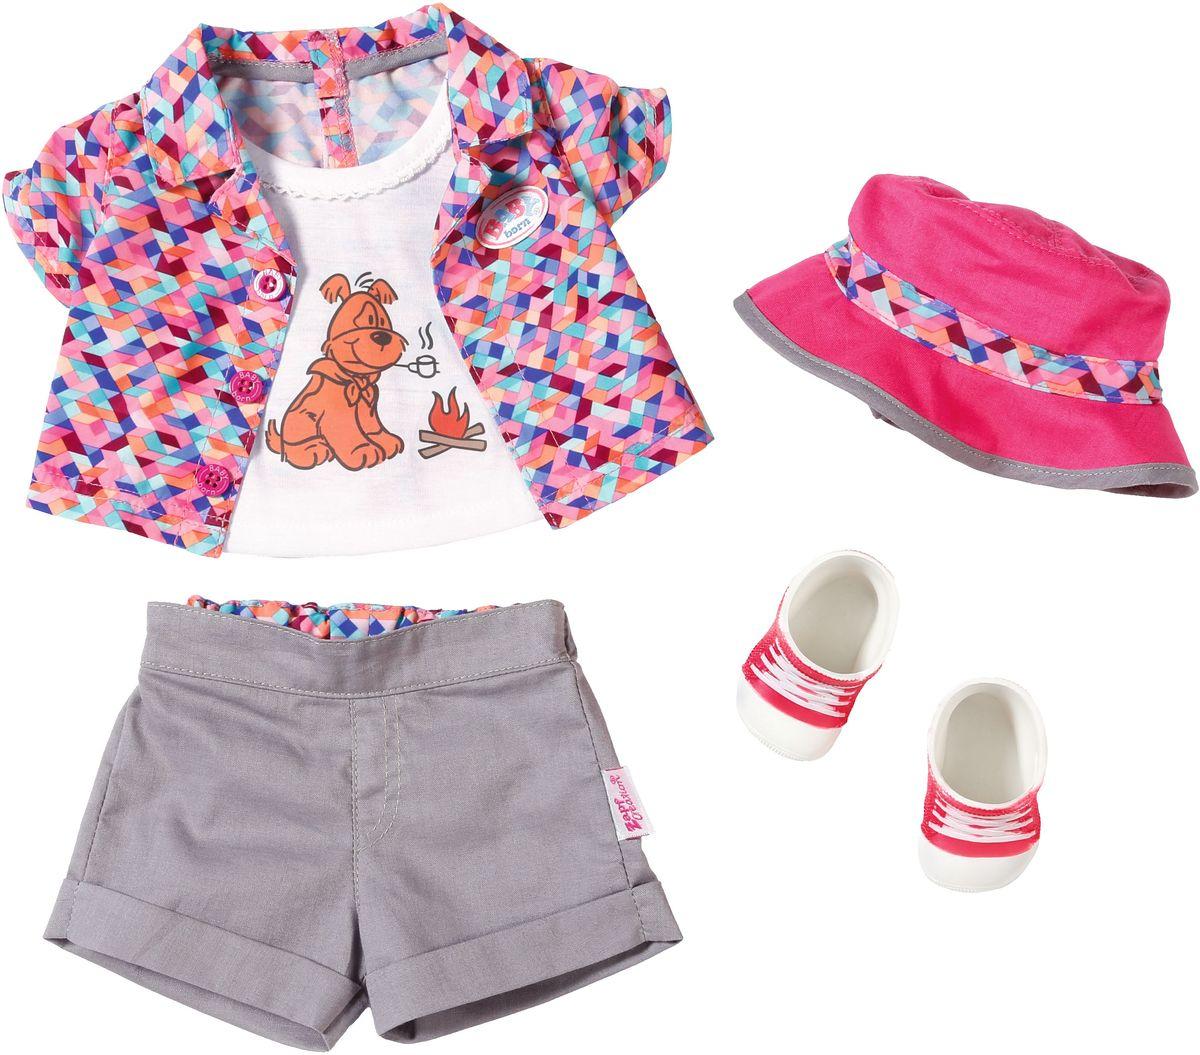 Baby Born Одежда для отдыха на природе 823-767